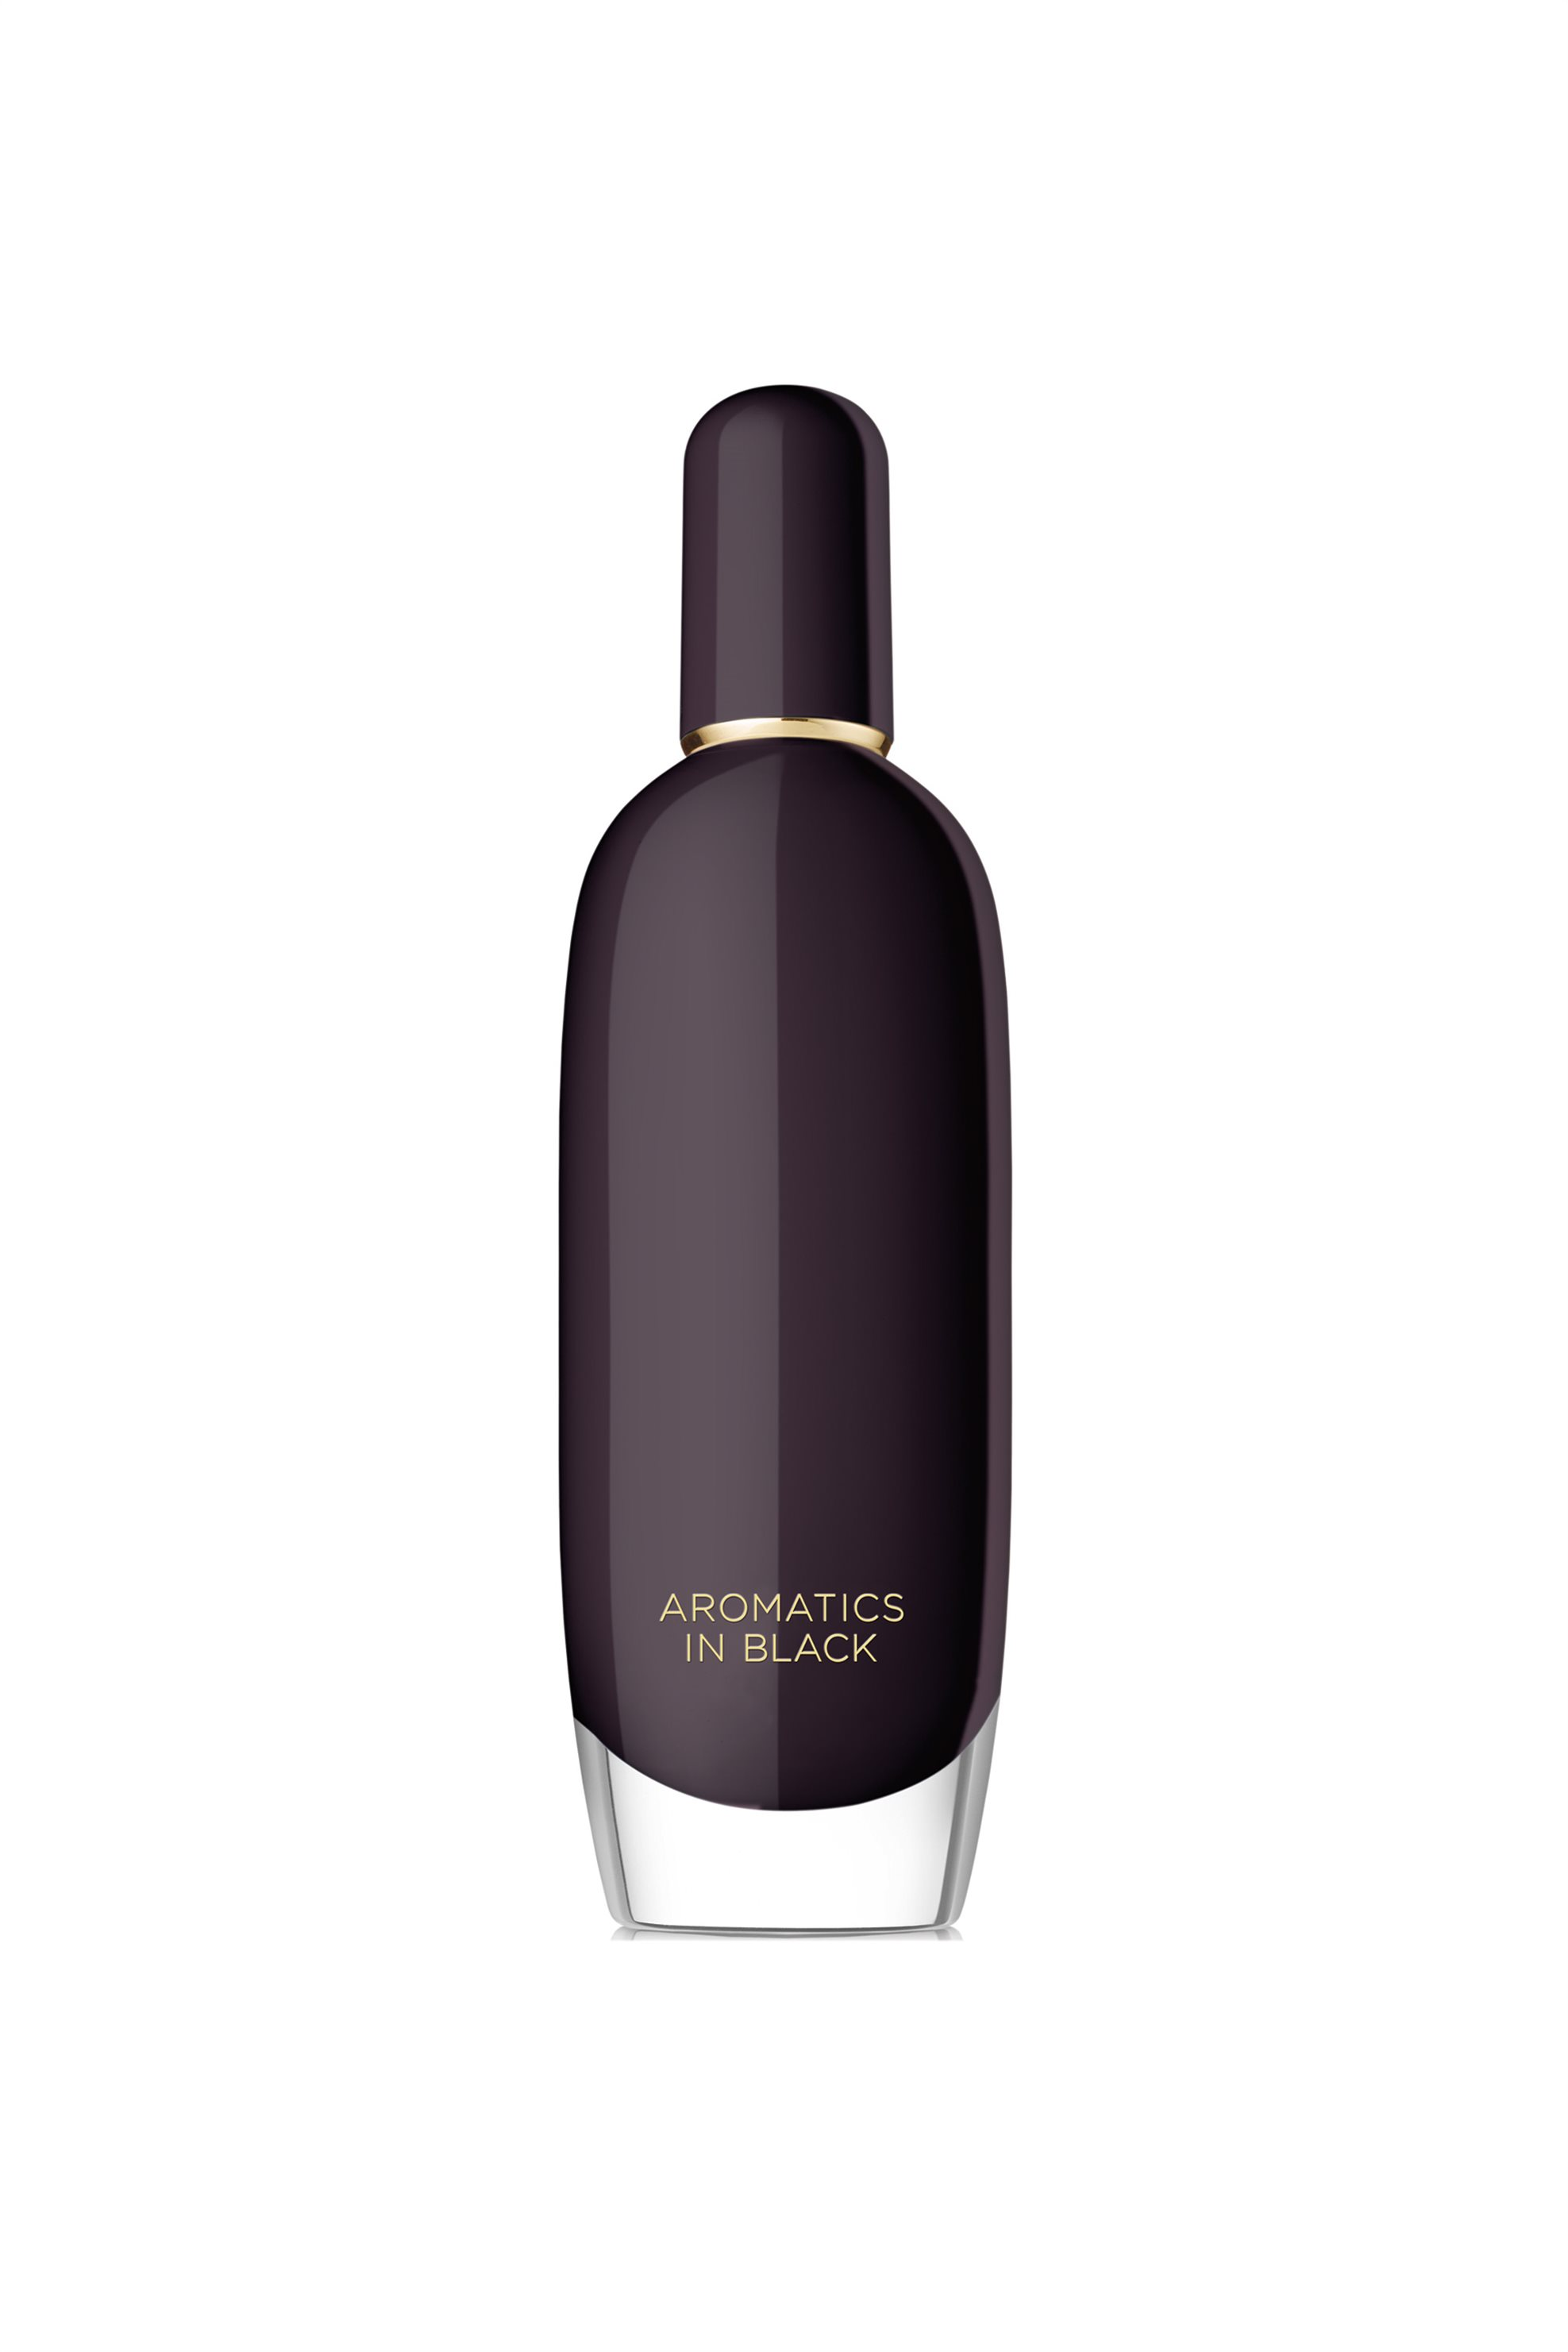 Clinique Aromatics in Black EdP 30 ml - ZNF6010000 ομορφια   καλλυντικα επιλεκτικησ   αρώματα   γυναικεία αρώματα   eau de parfum